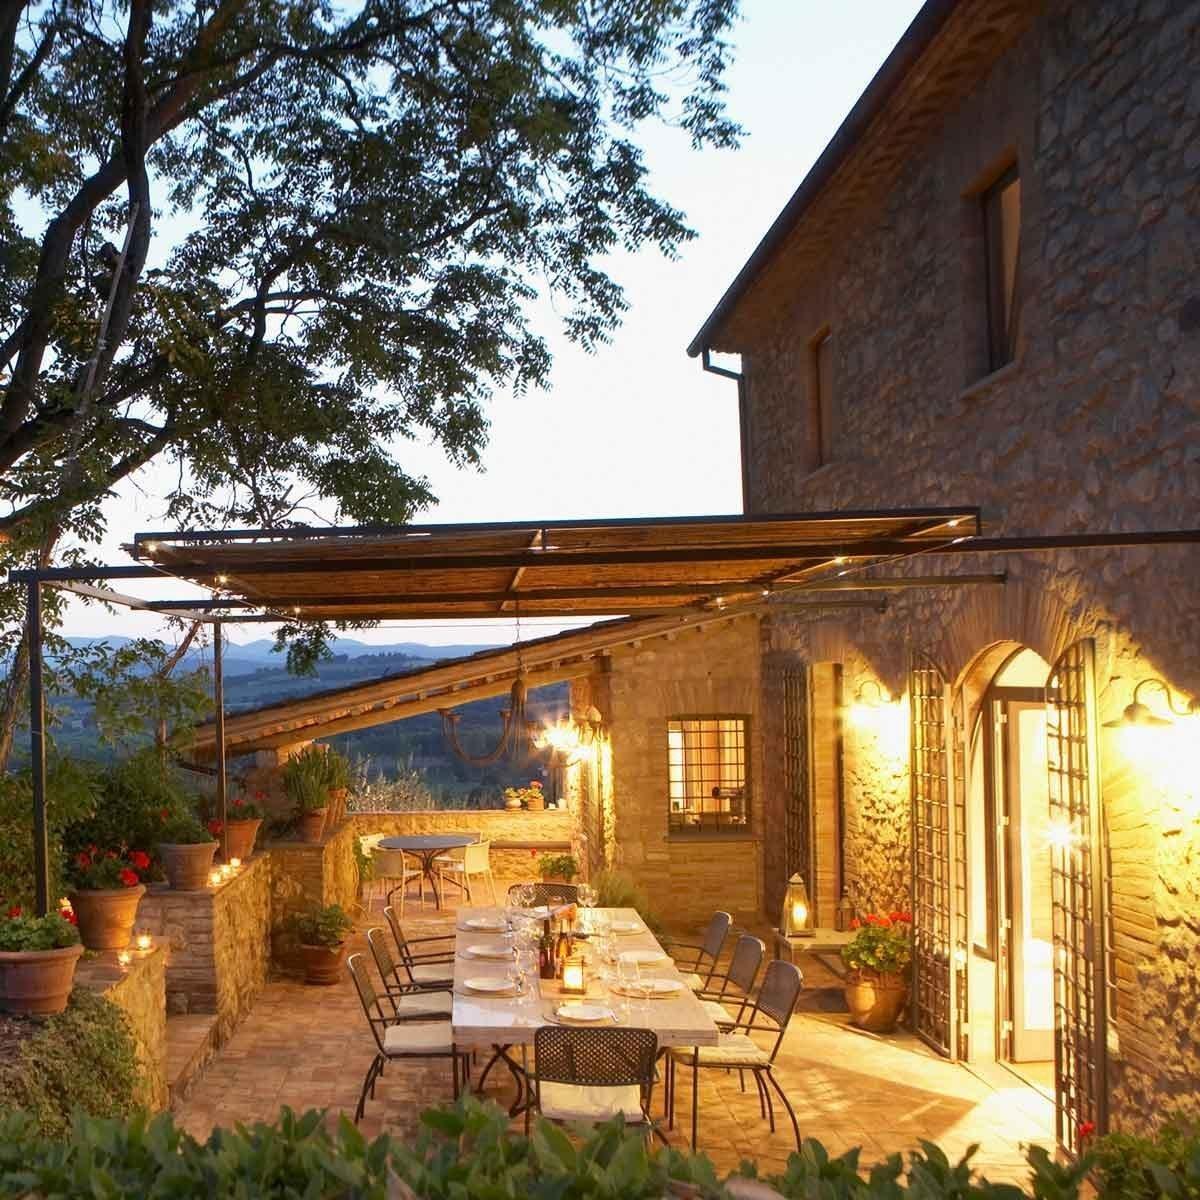 Patio Décor Ideas for a Comfortable and Stylish Backyard Escape